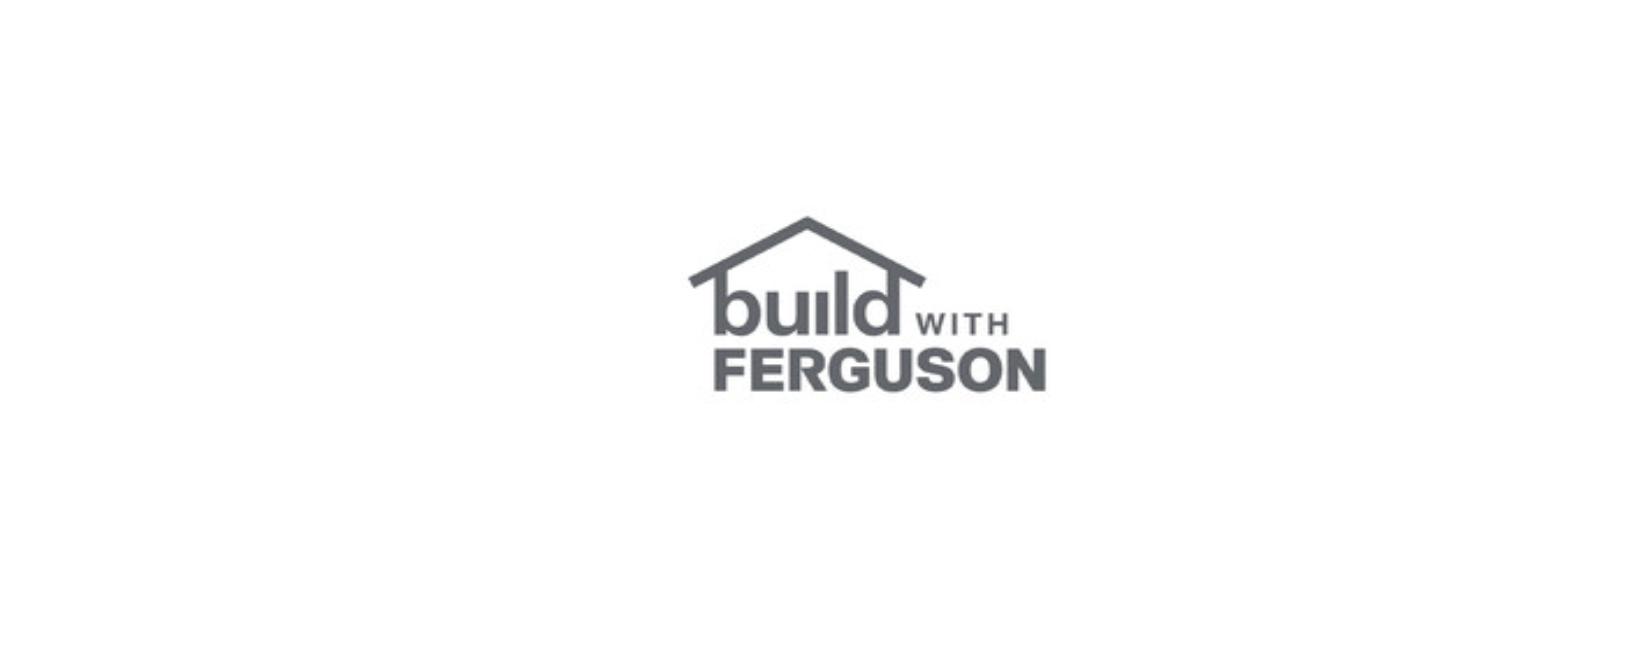 Build With Ferguson Discount Code 2021